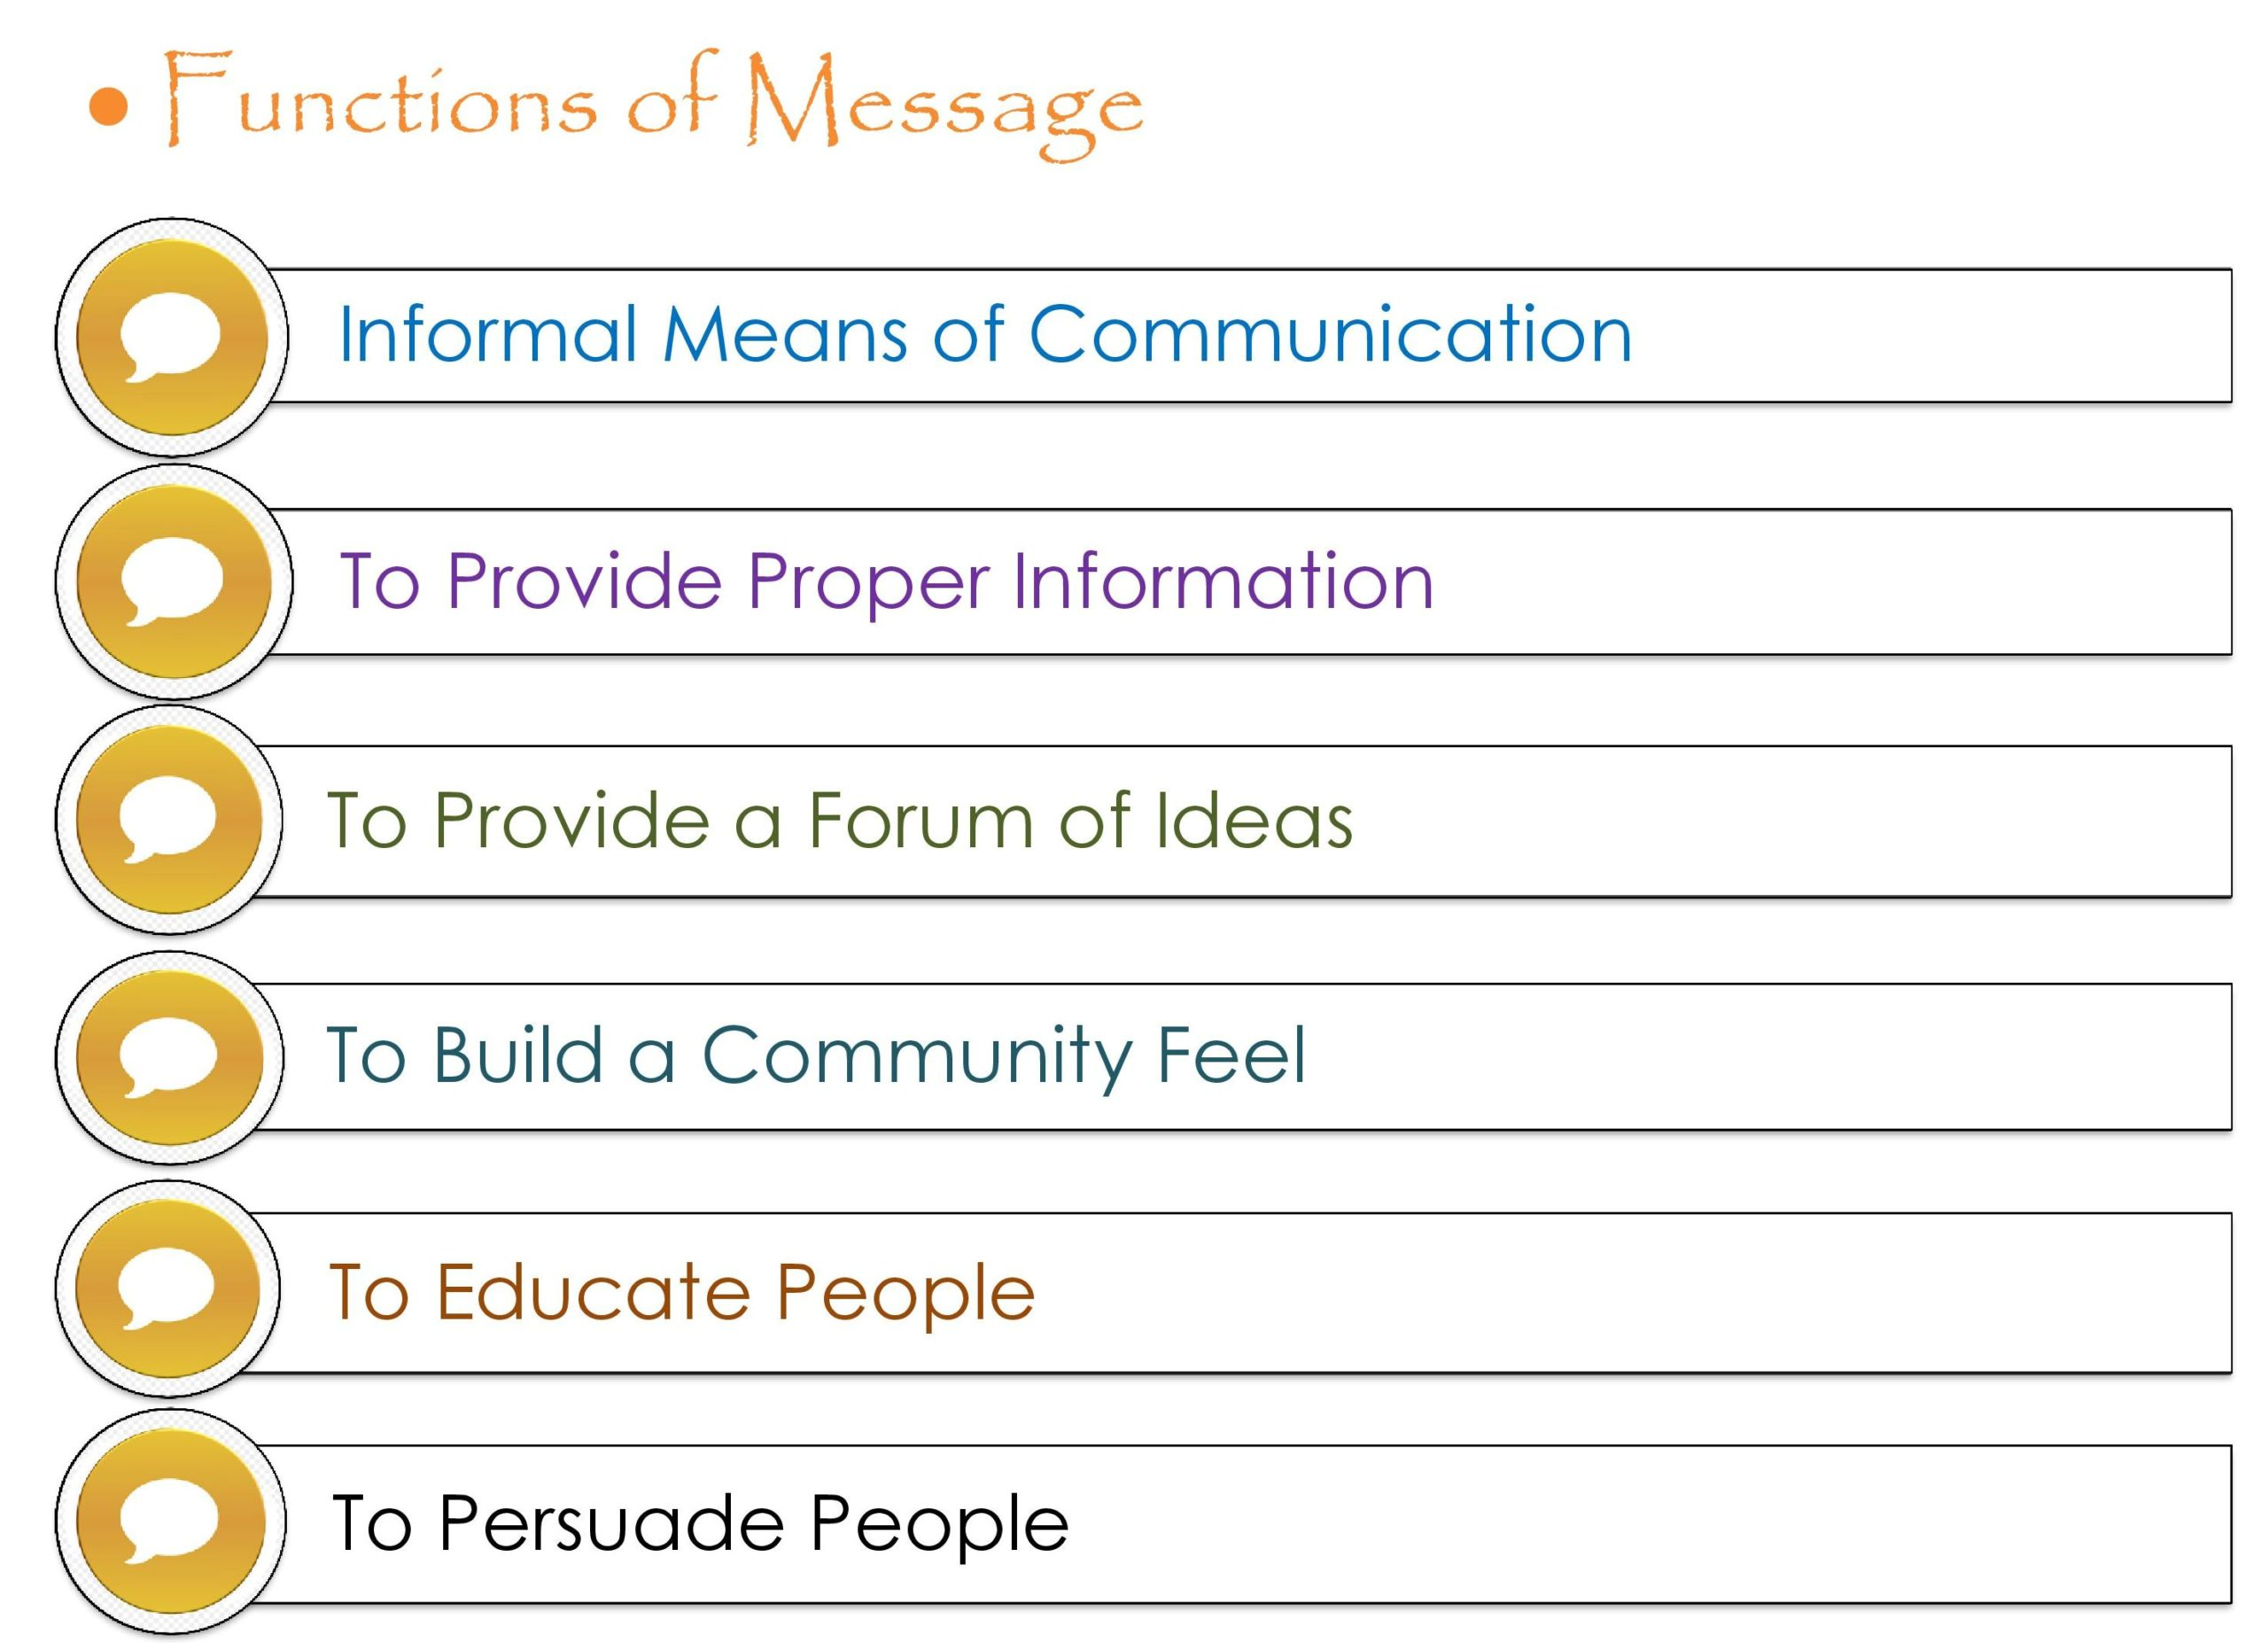 drafting_virtual_message_06_